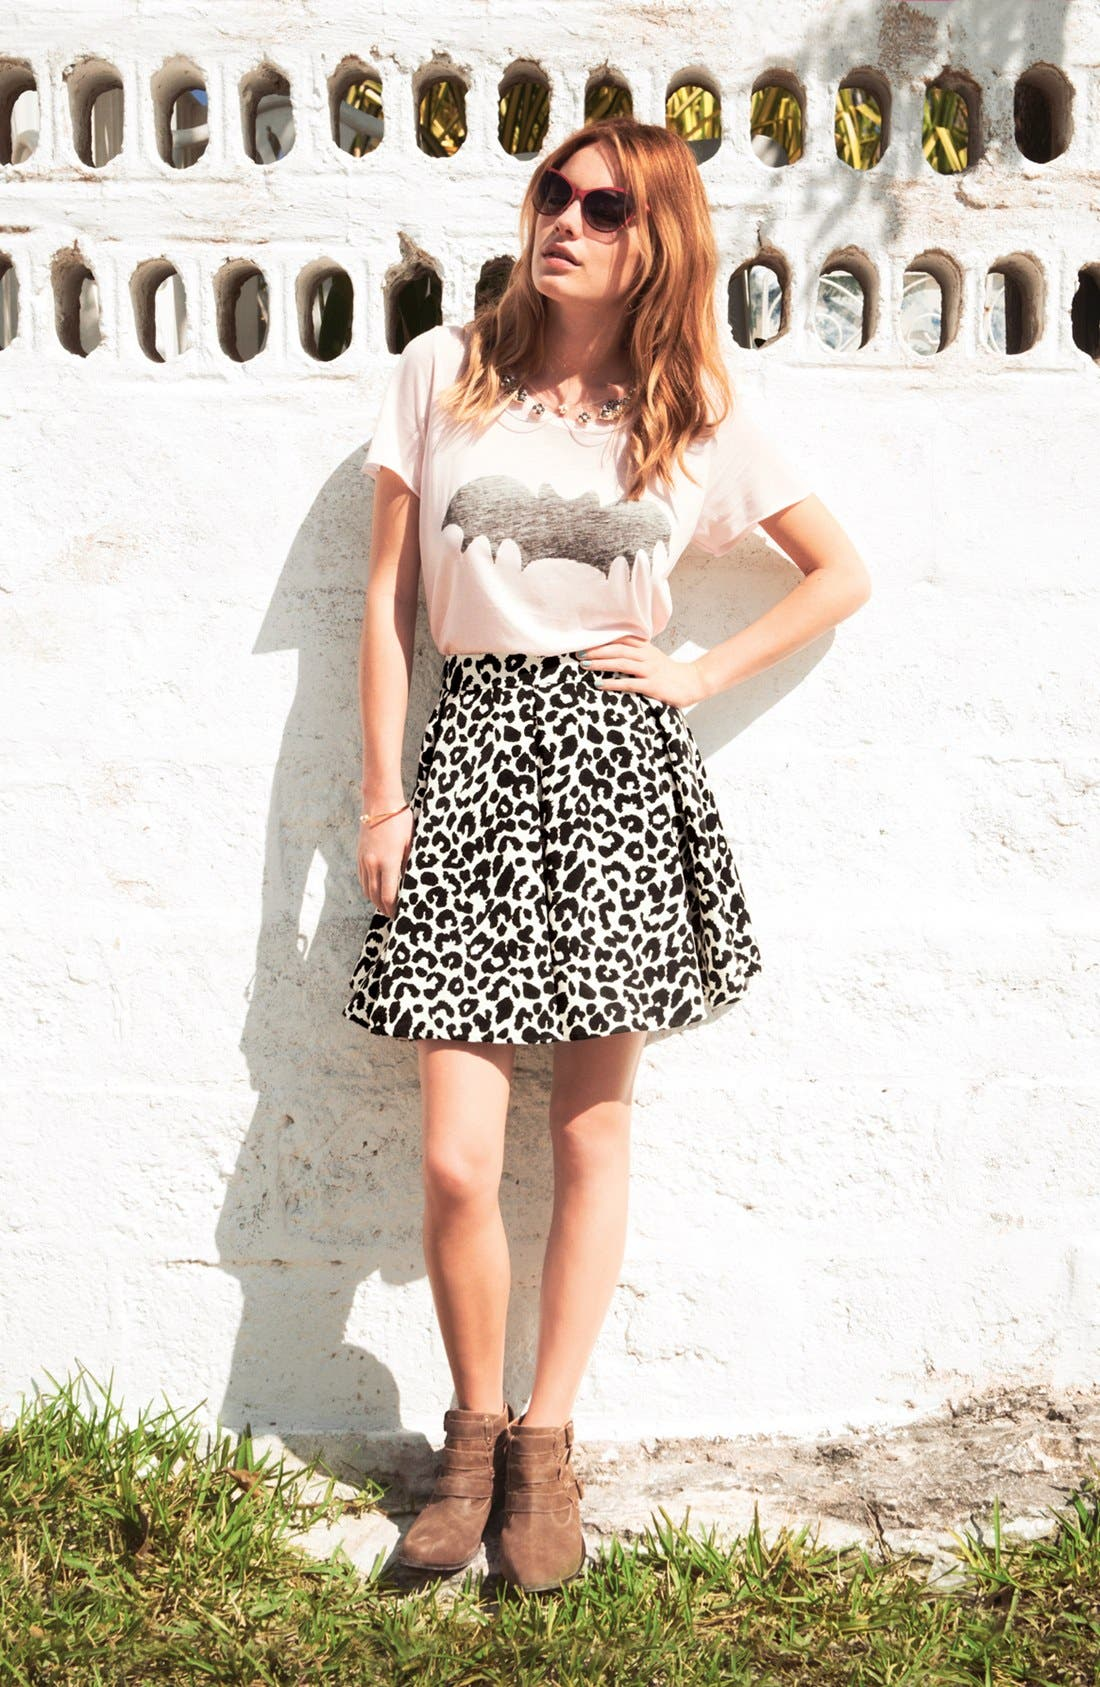 Alternate Image 1 Selected - Zoe Karssen Tee & Collective Concepts Skirt